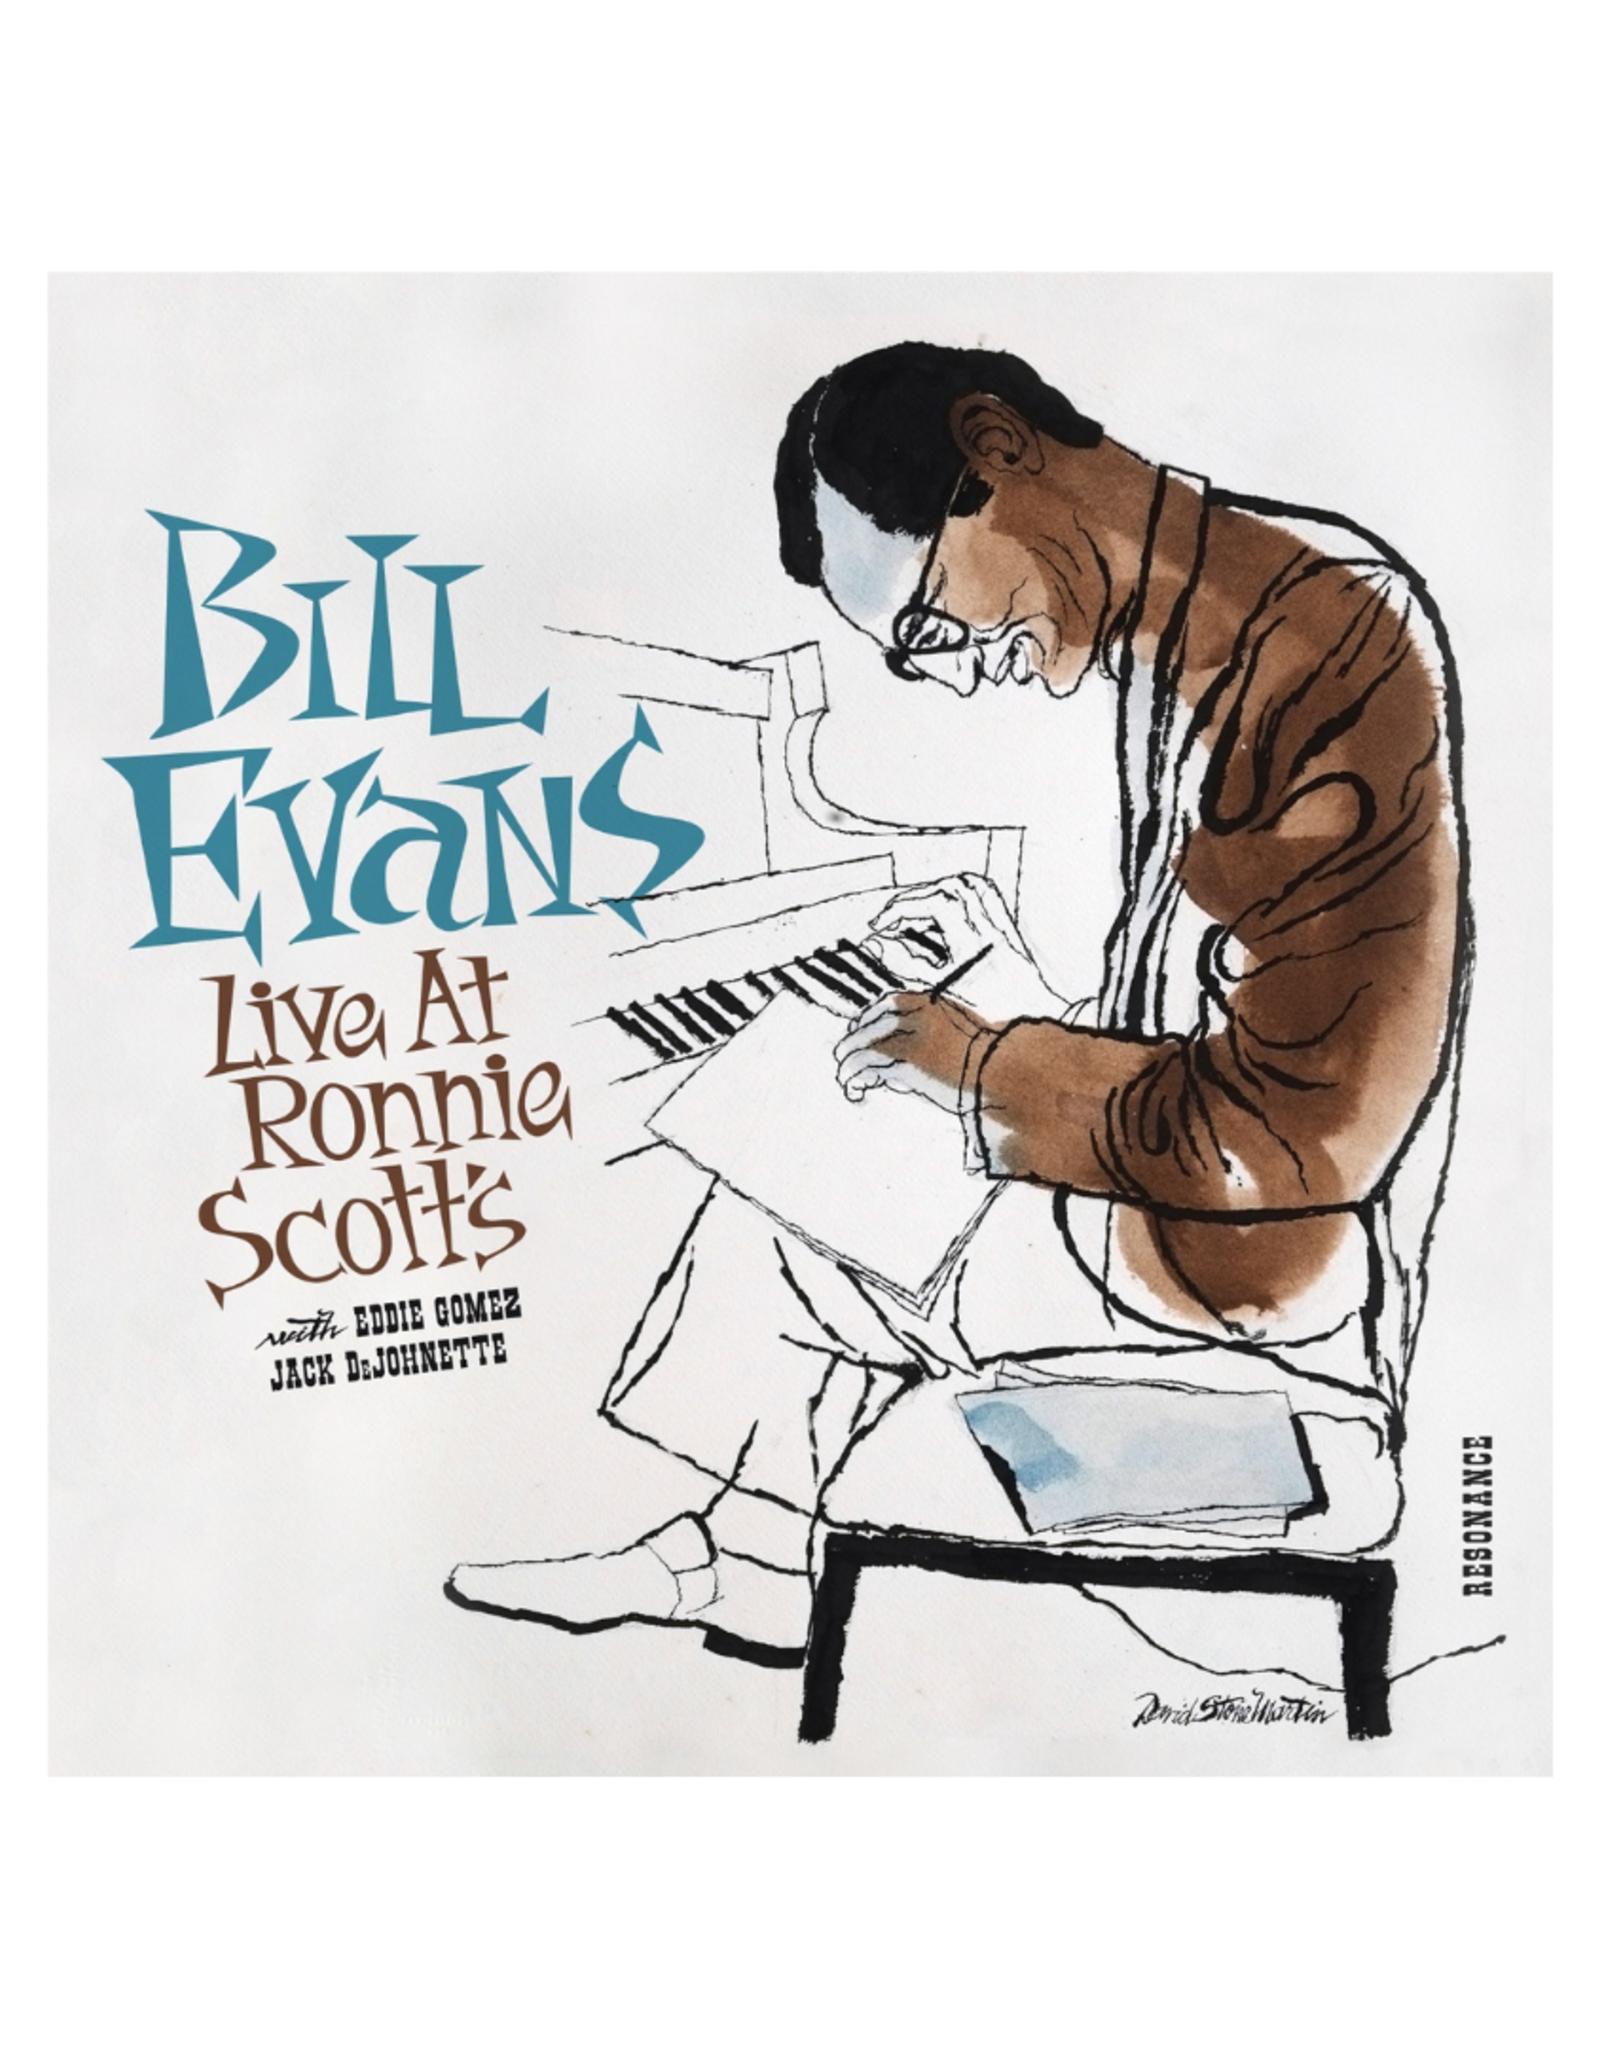 Bill Evans - Live At Ronnie Scott'S (With Eddie Gomez & Jack Dejohnette) (2Lp/Deluxe Edition) (RSD 2020 BF)